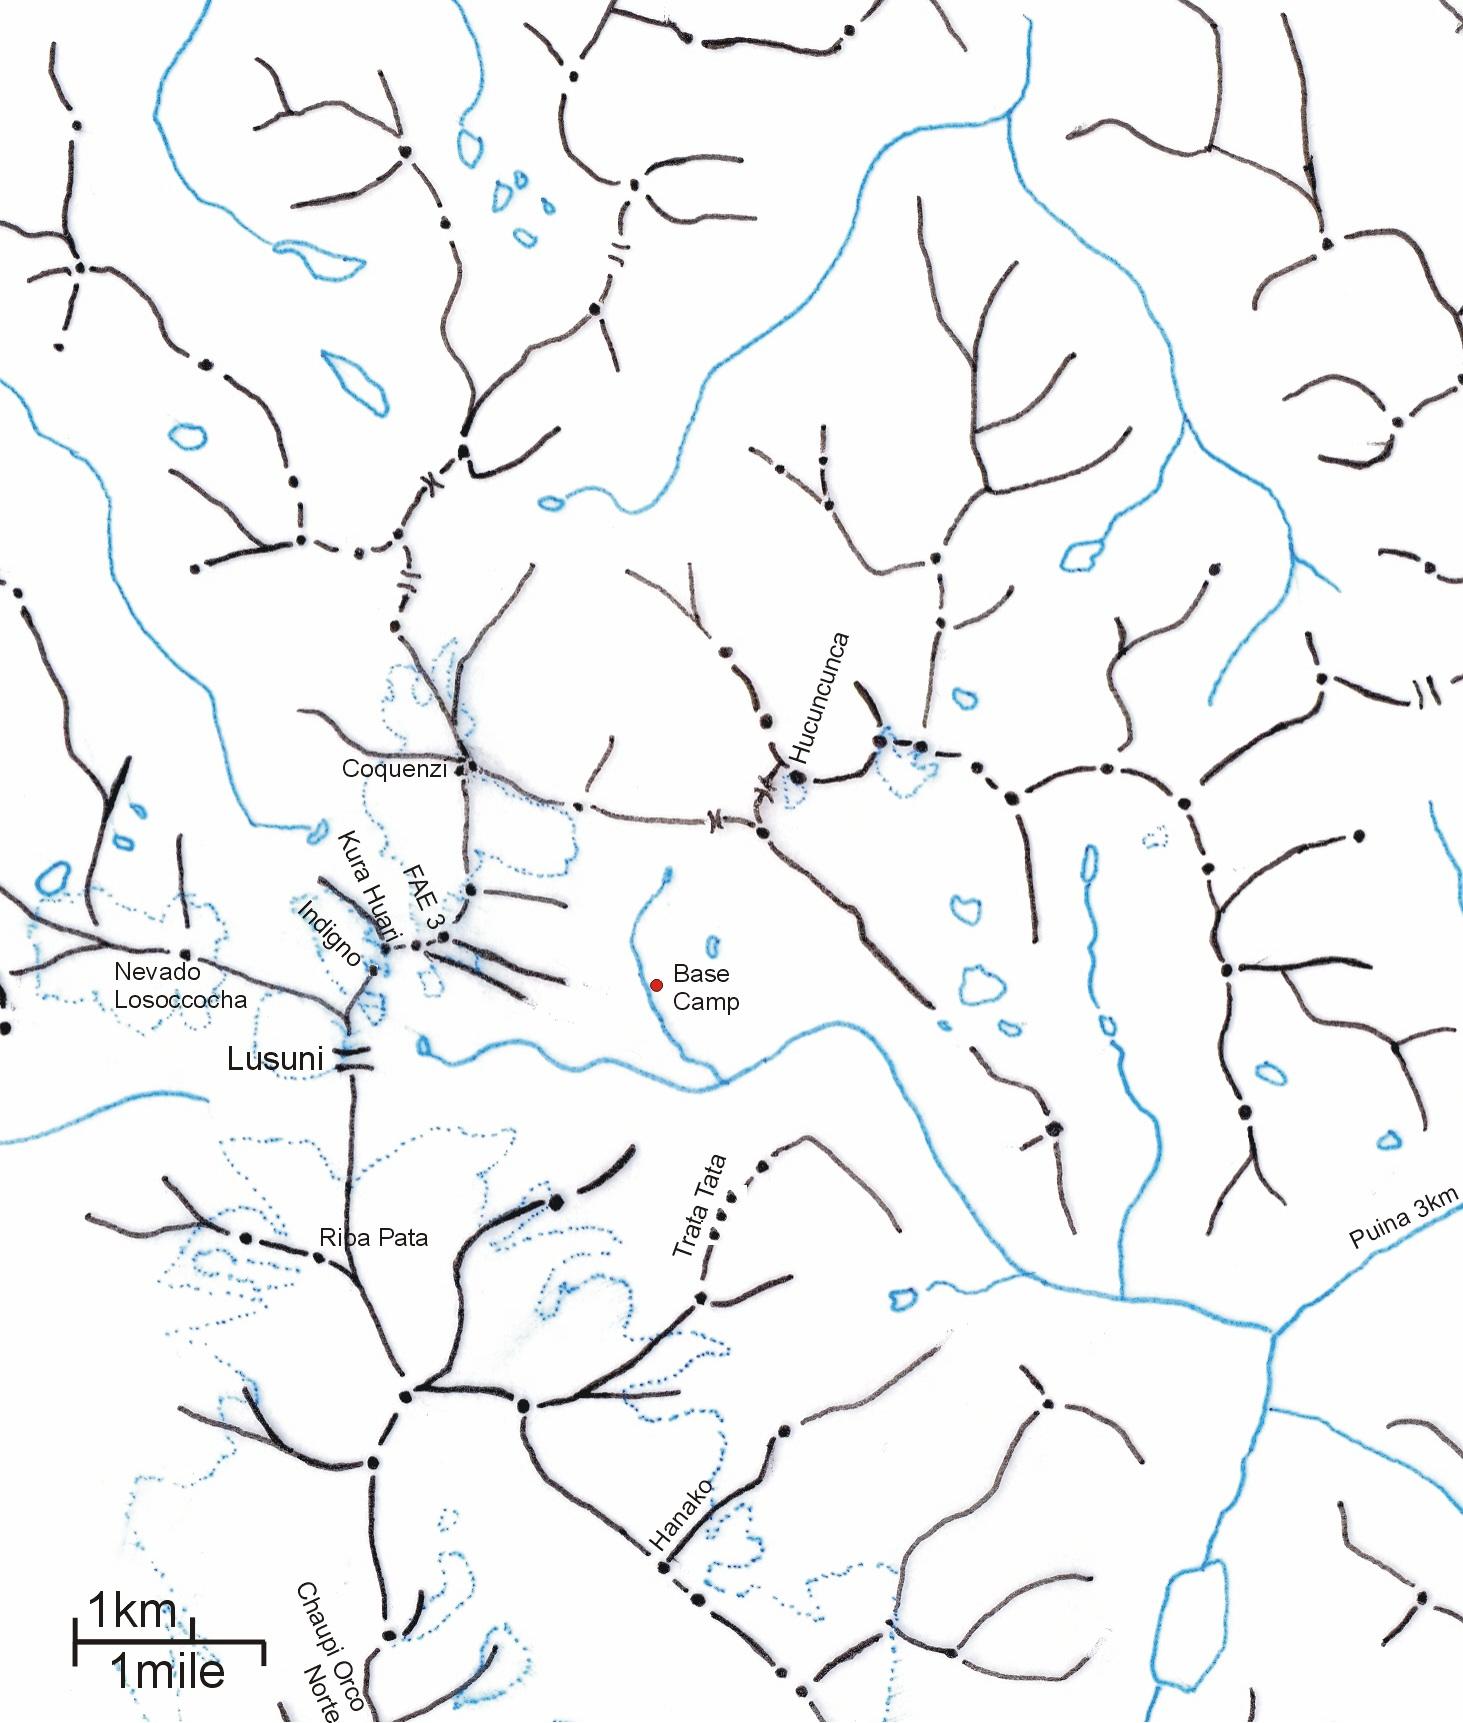 Map by Wojciech Chaladaj.